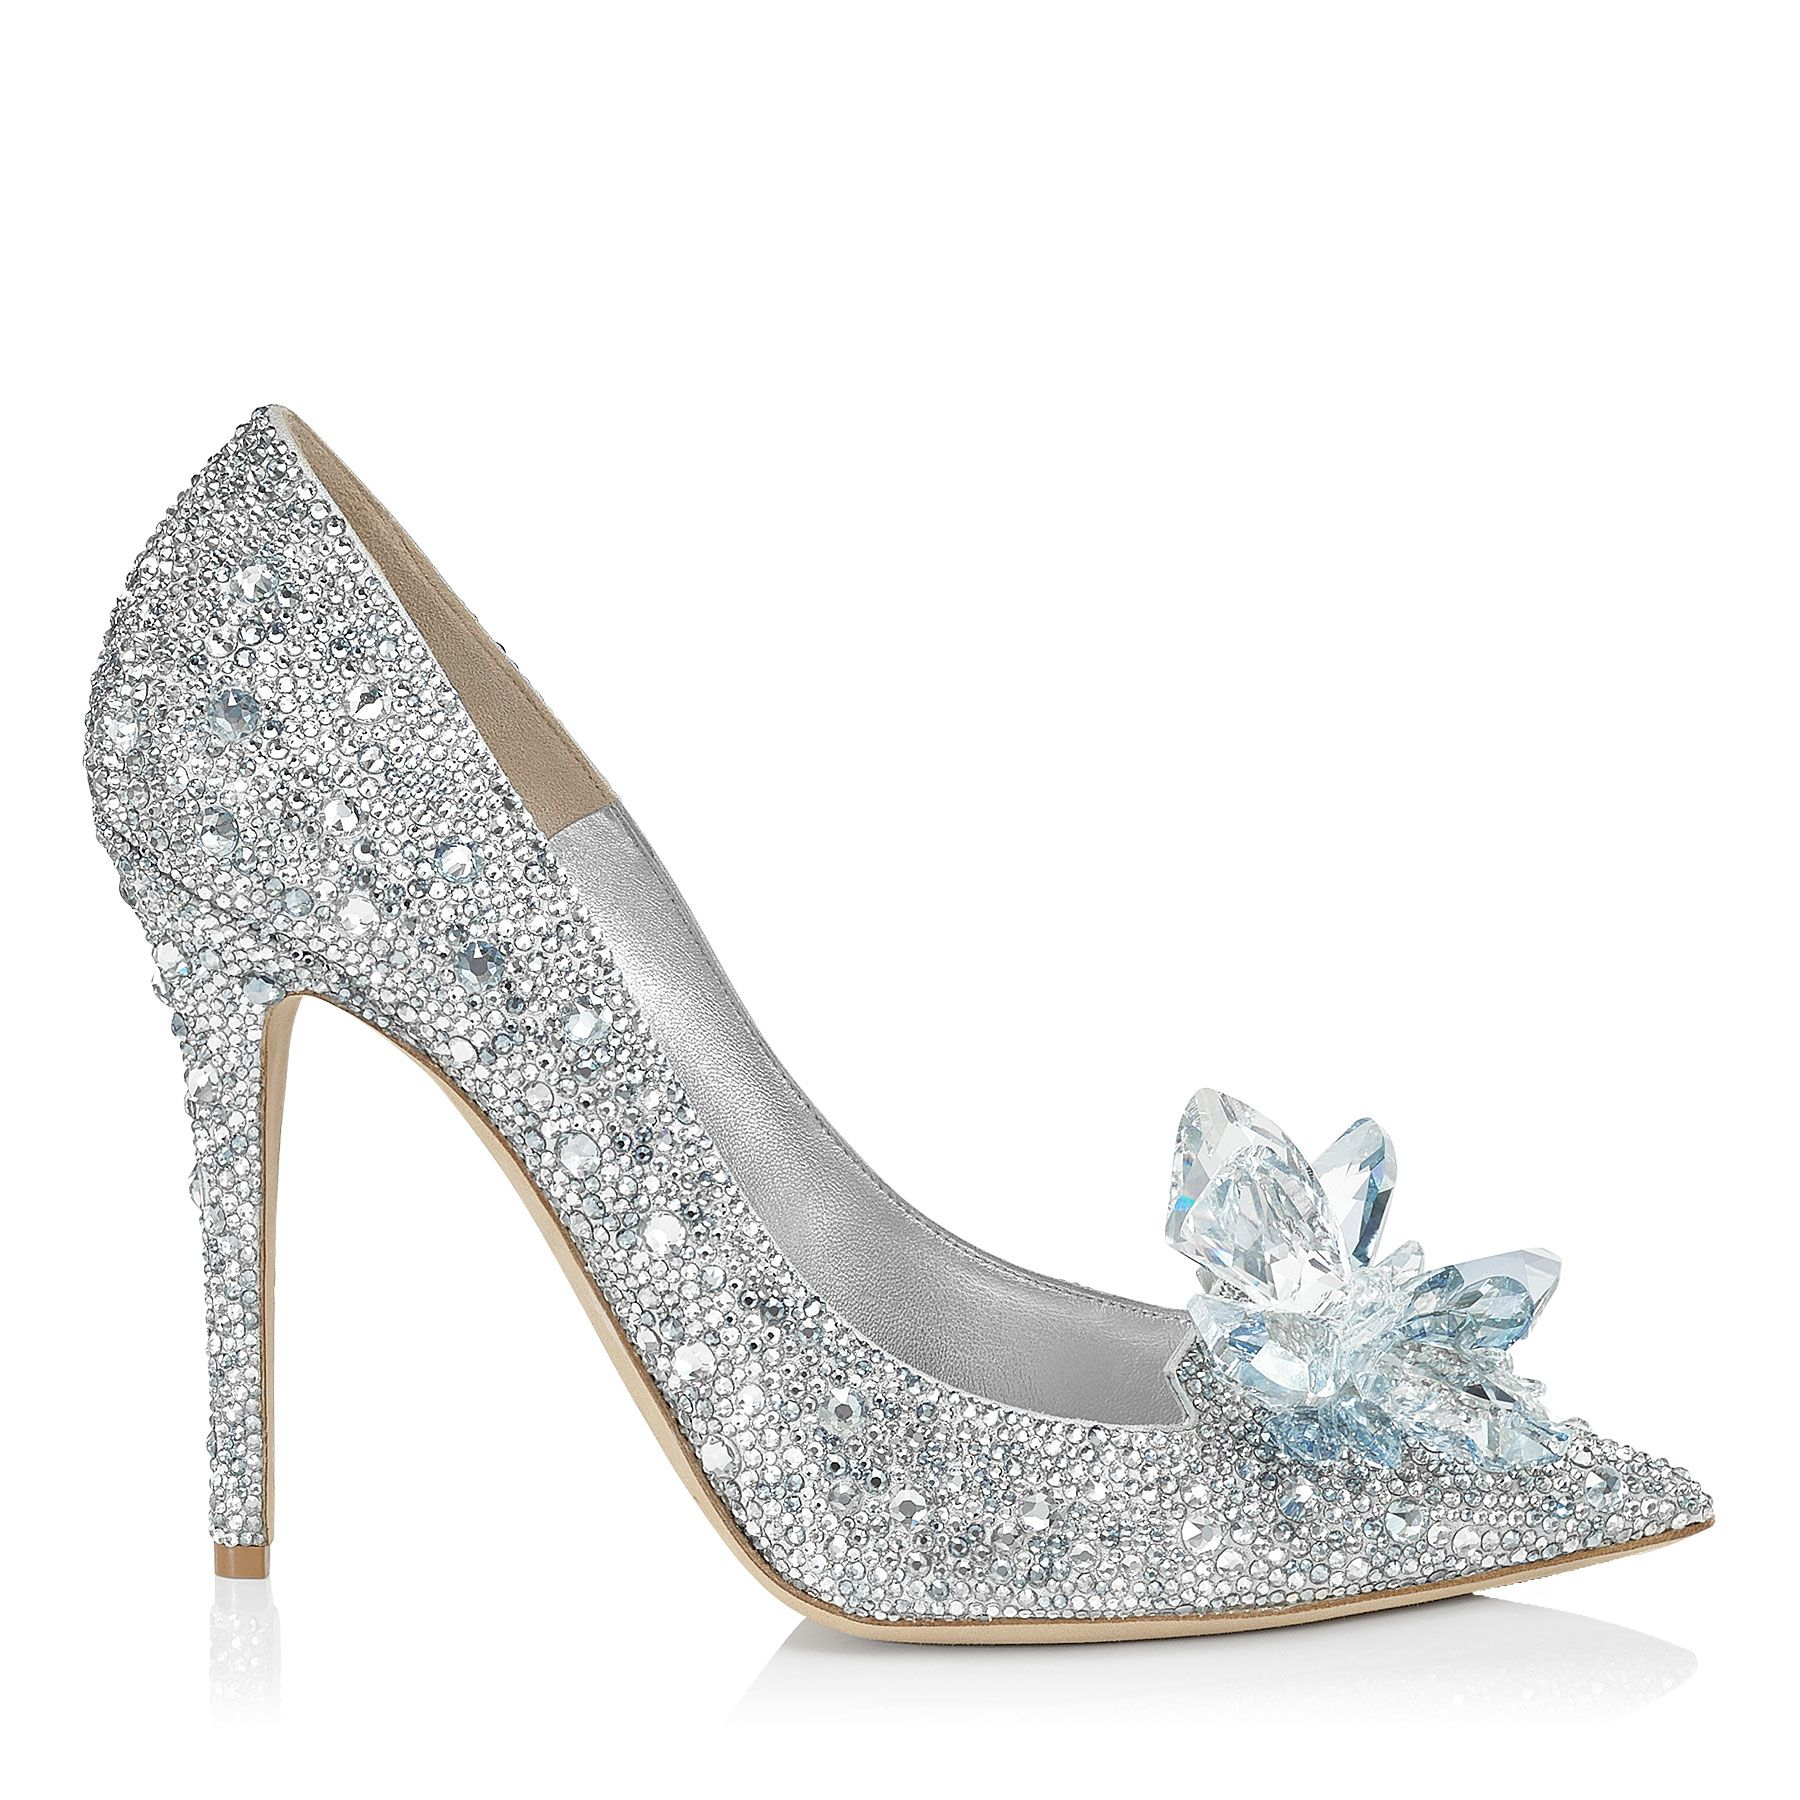 Jimmy Choo Highest Price Shoe